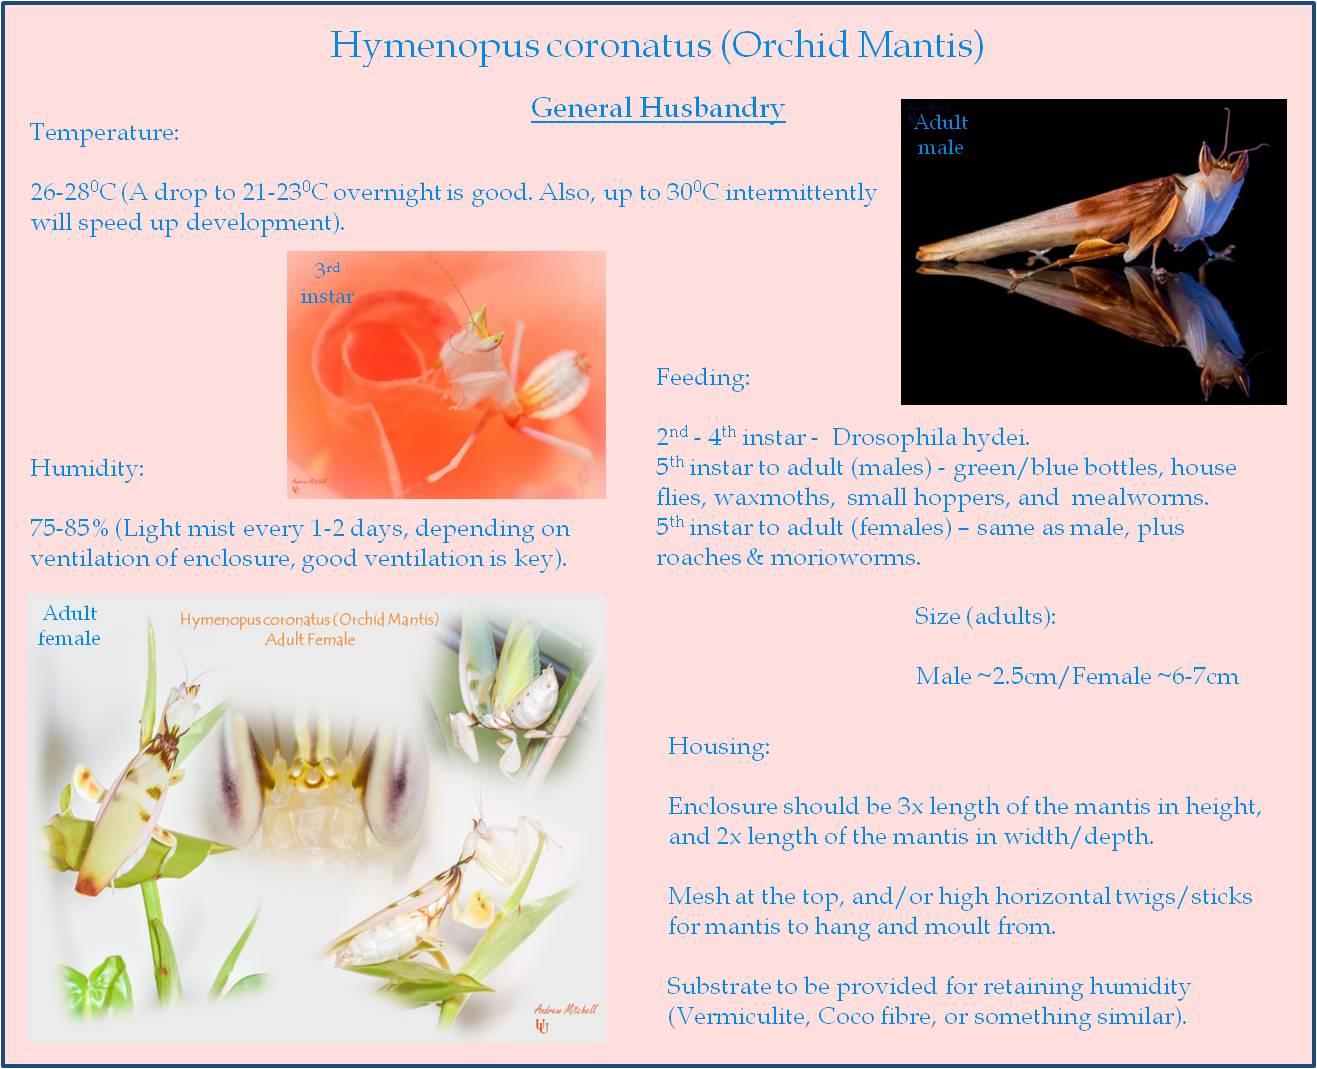 Hymenopus coronatus (Orchid Mantis) - Basic Care Sheet